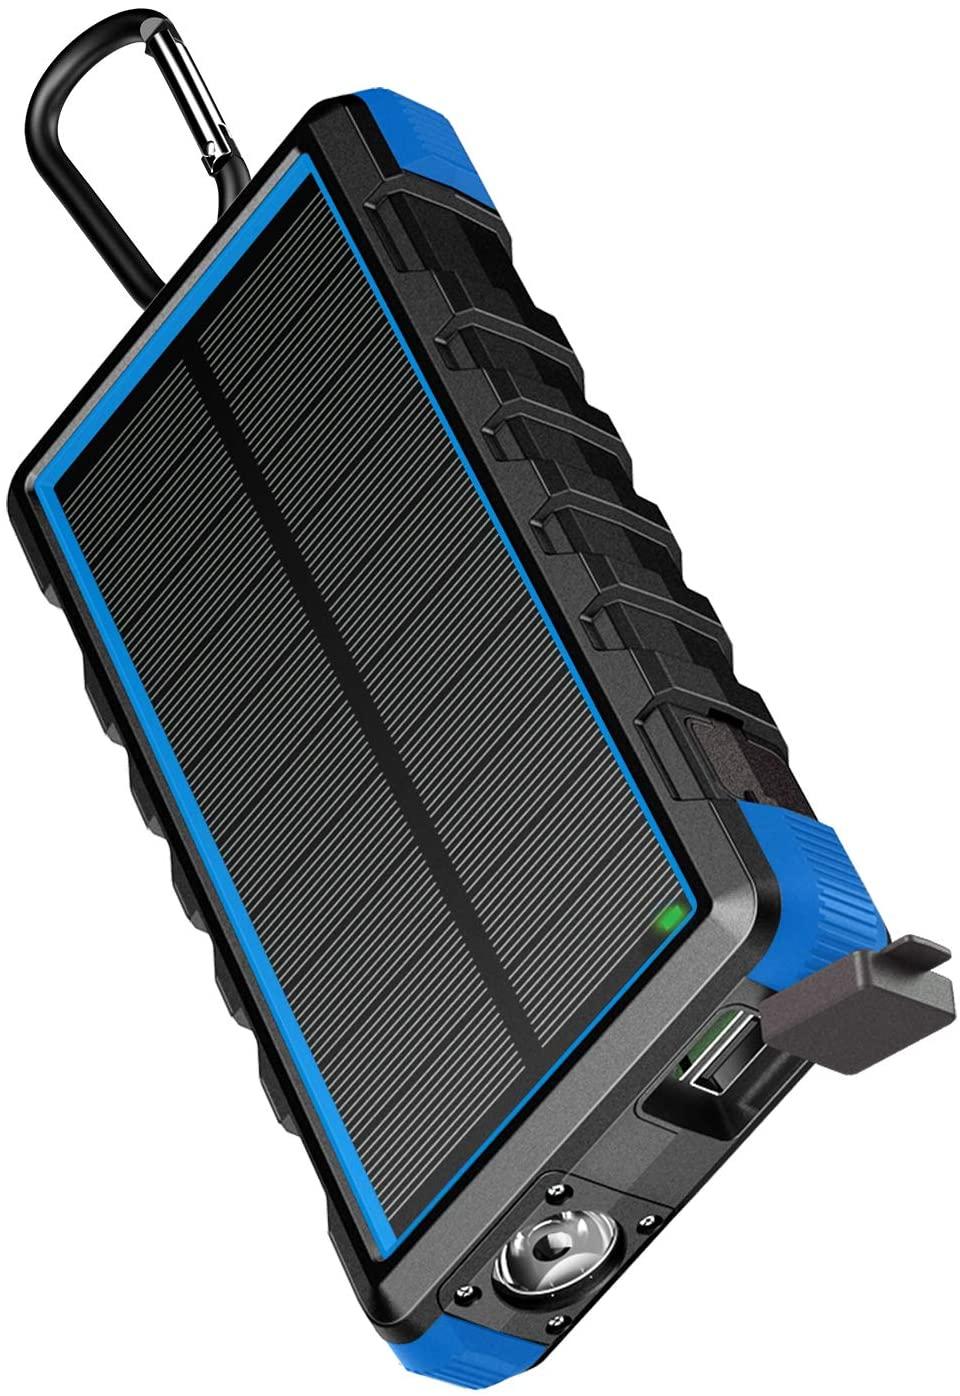 EasyAcc Powerbank 24000mAh Wasserdicht IP66 Outdoor Solar Akkupack